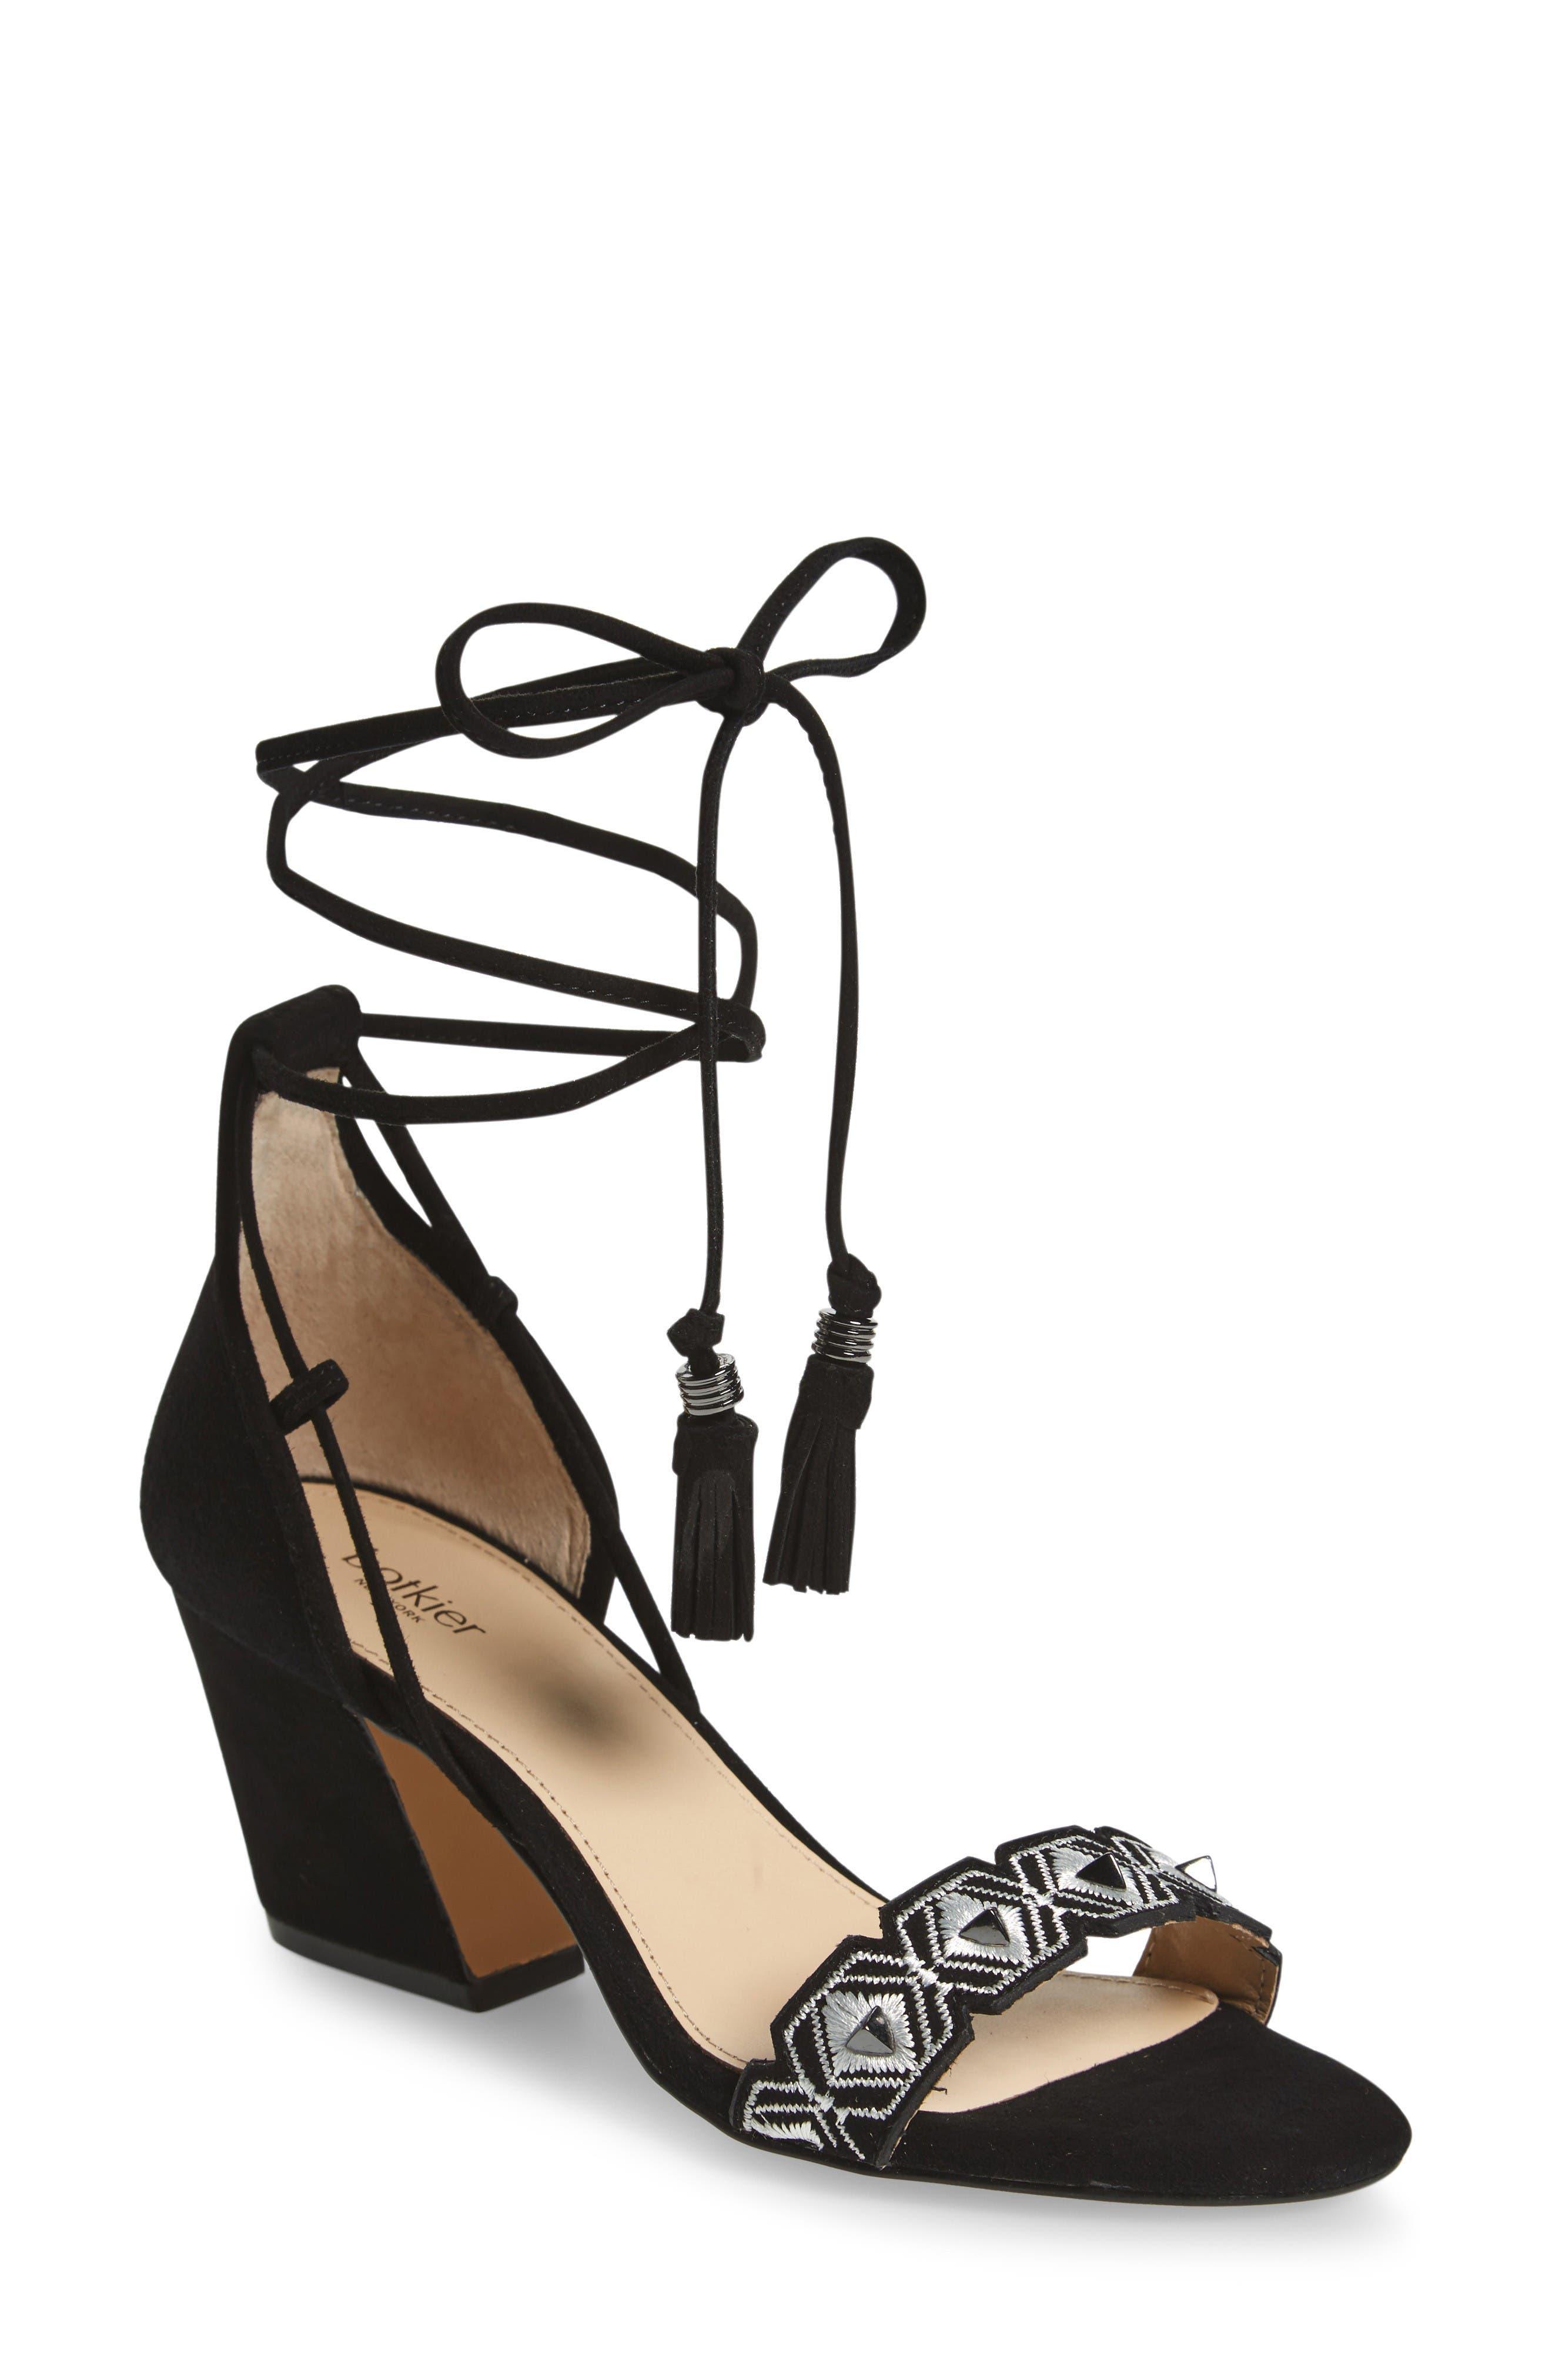 Penelope Embroidered Ankle Wrap Sandal,                             Main thumbnail 1, color,                             Black White Combo